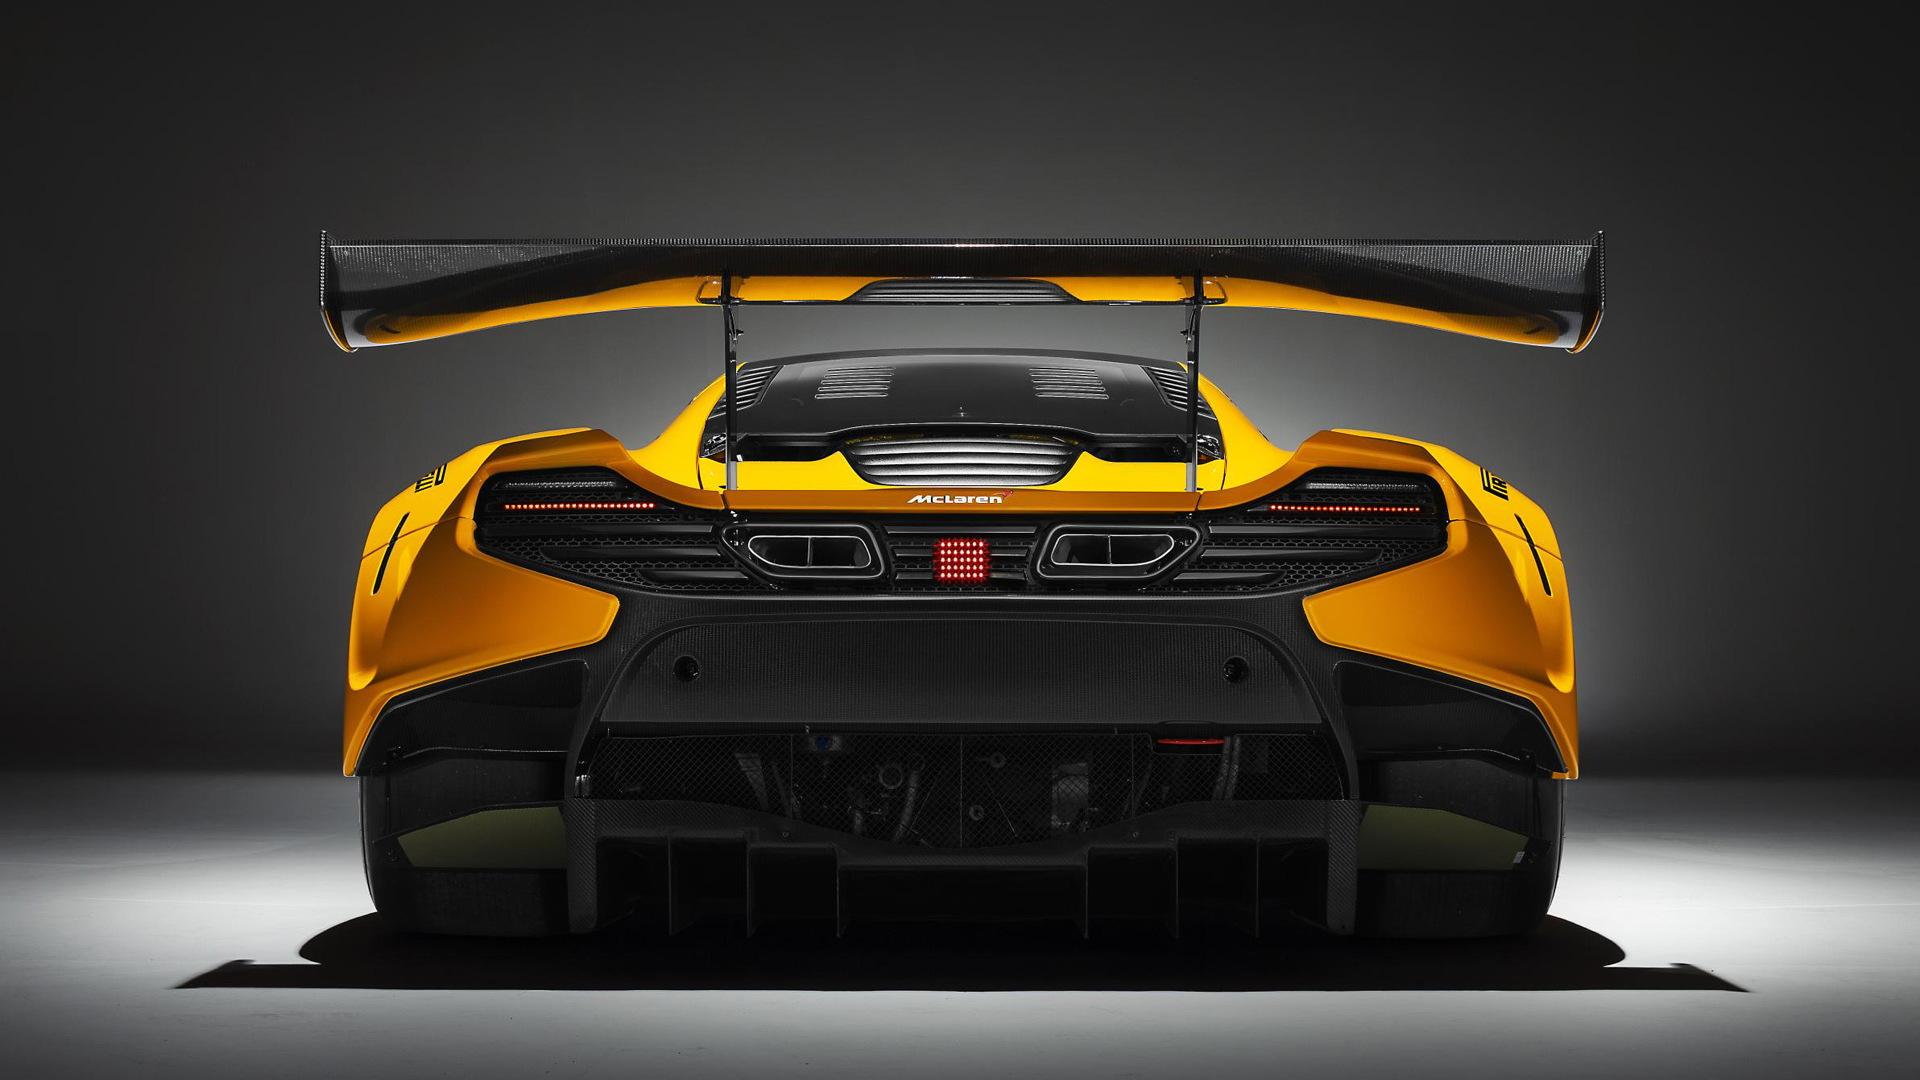 2016 McLaren 650S GT3 race car